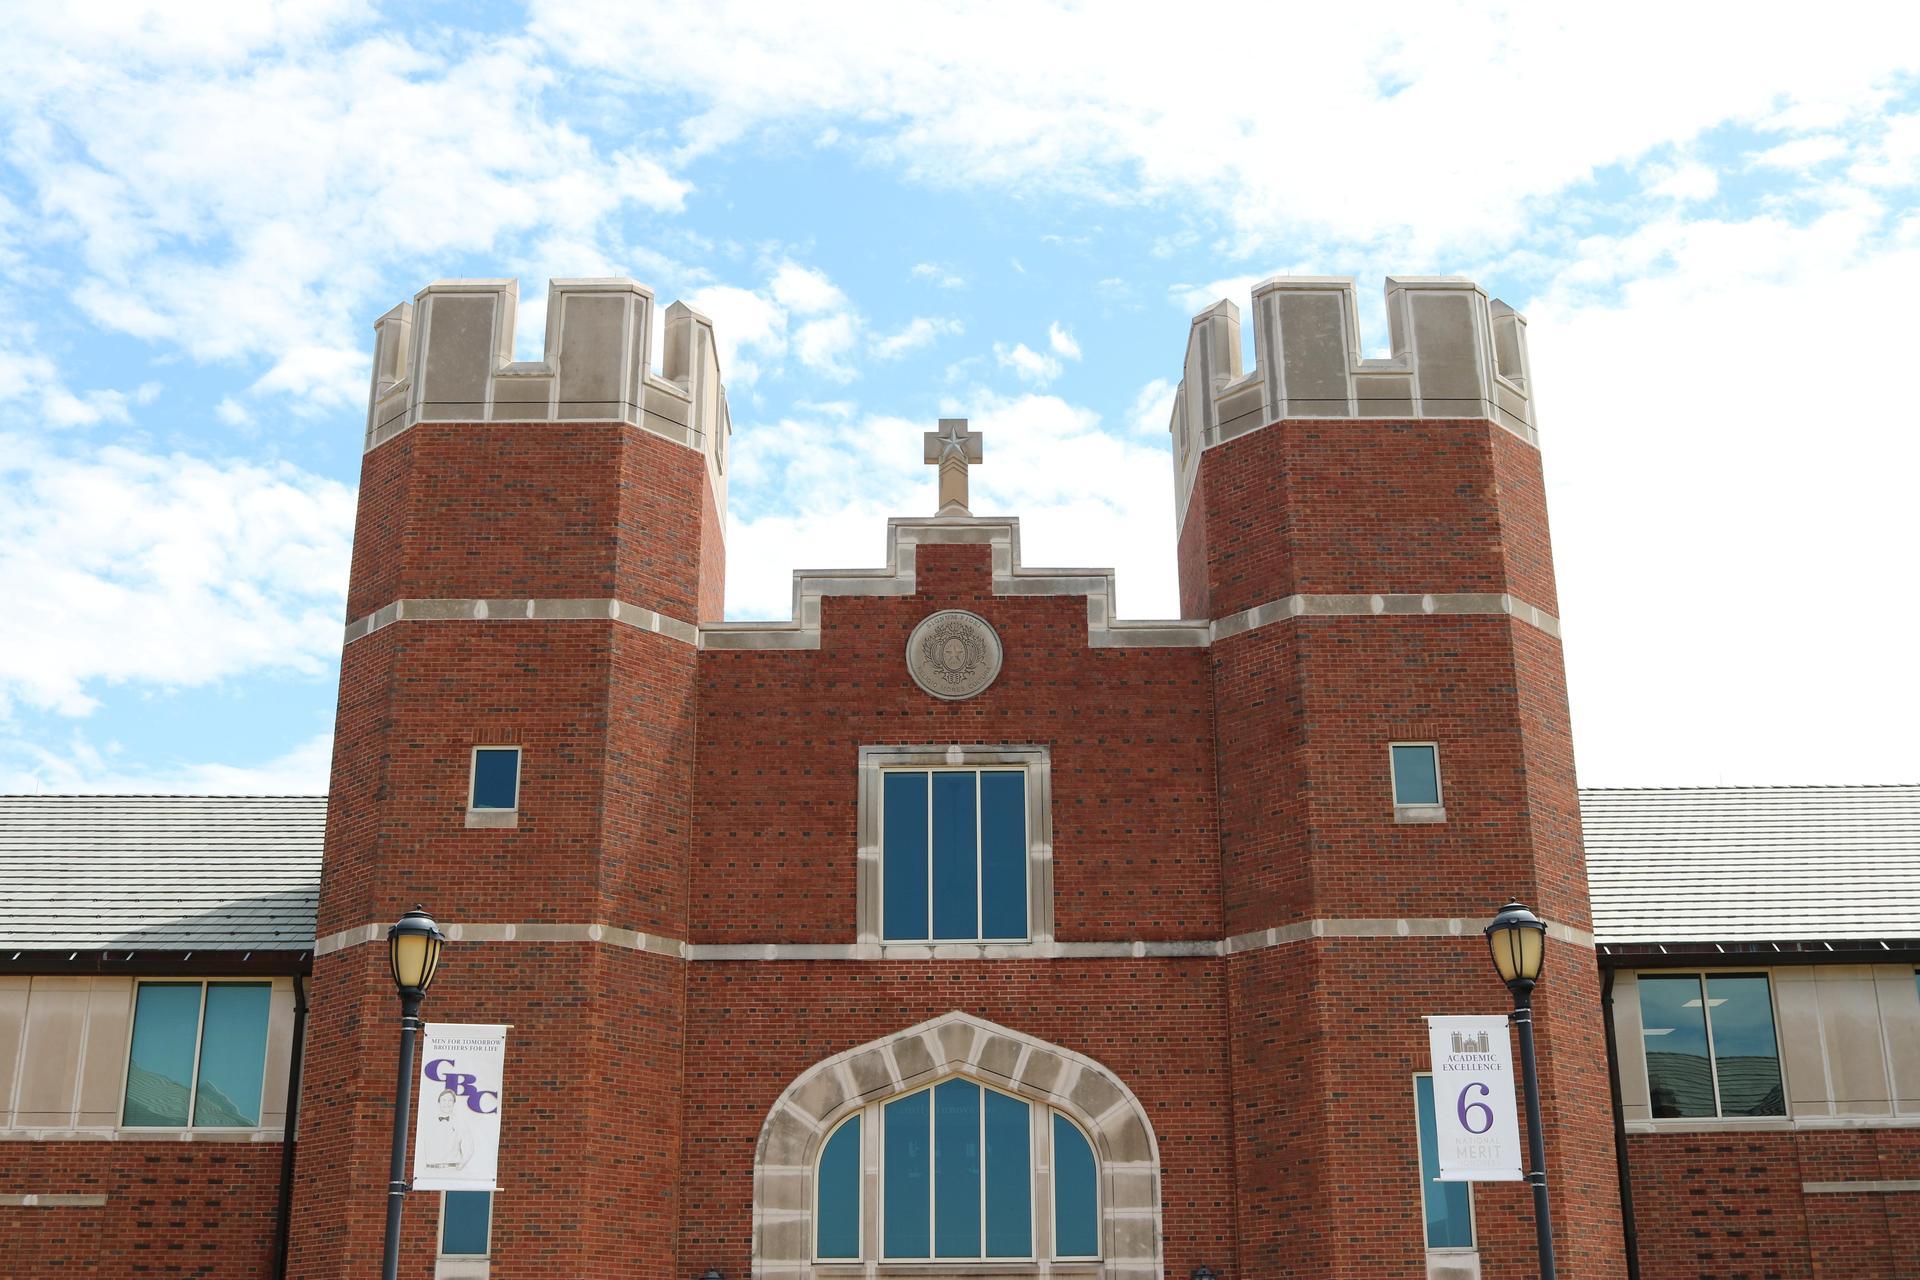 CBC front of school